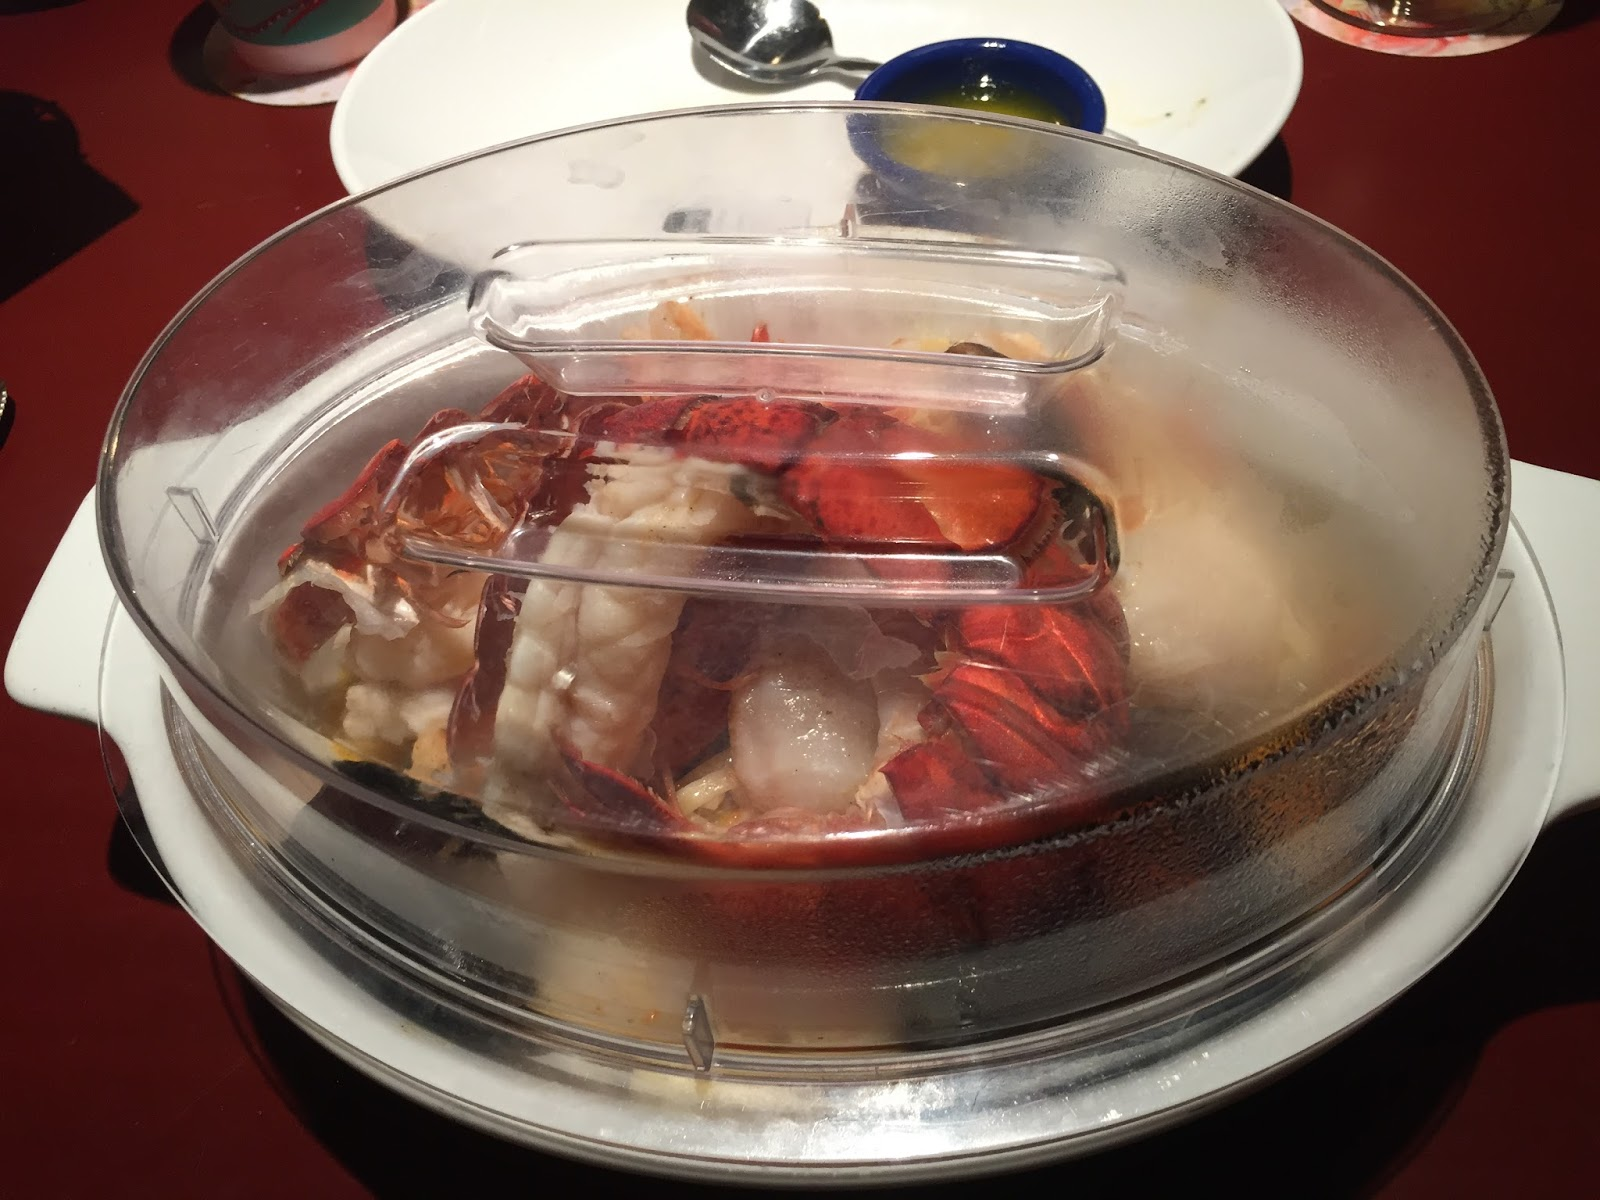 Bad Chain Restaurants X – Dread Lobster – I like food